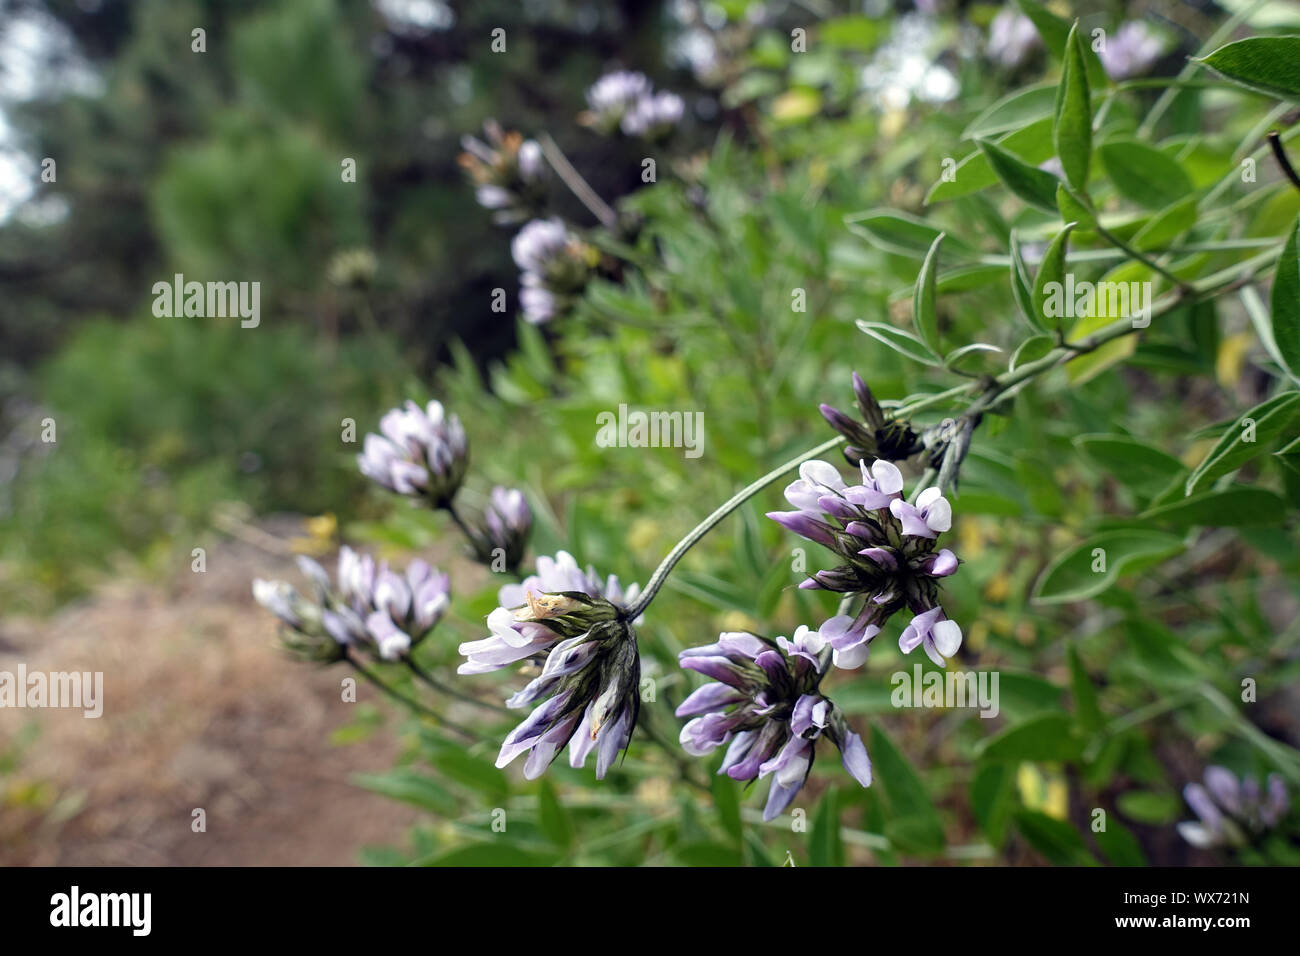 Arabian pea or pitch trefoil Stock Photo